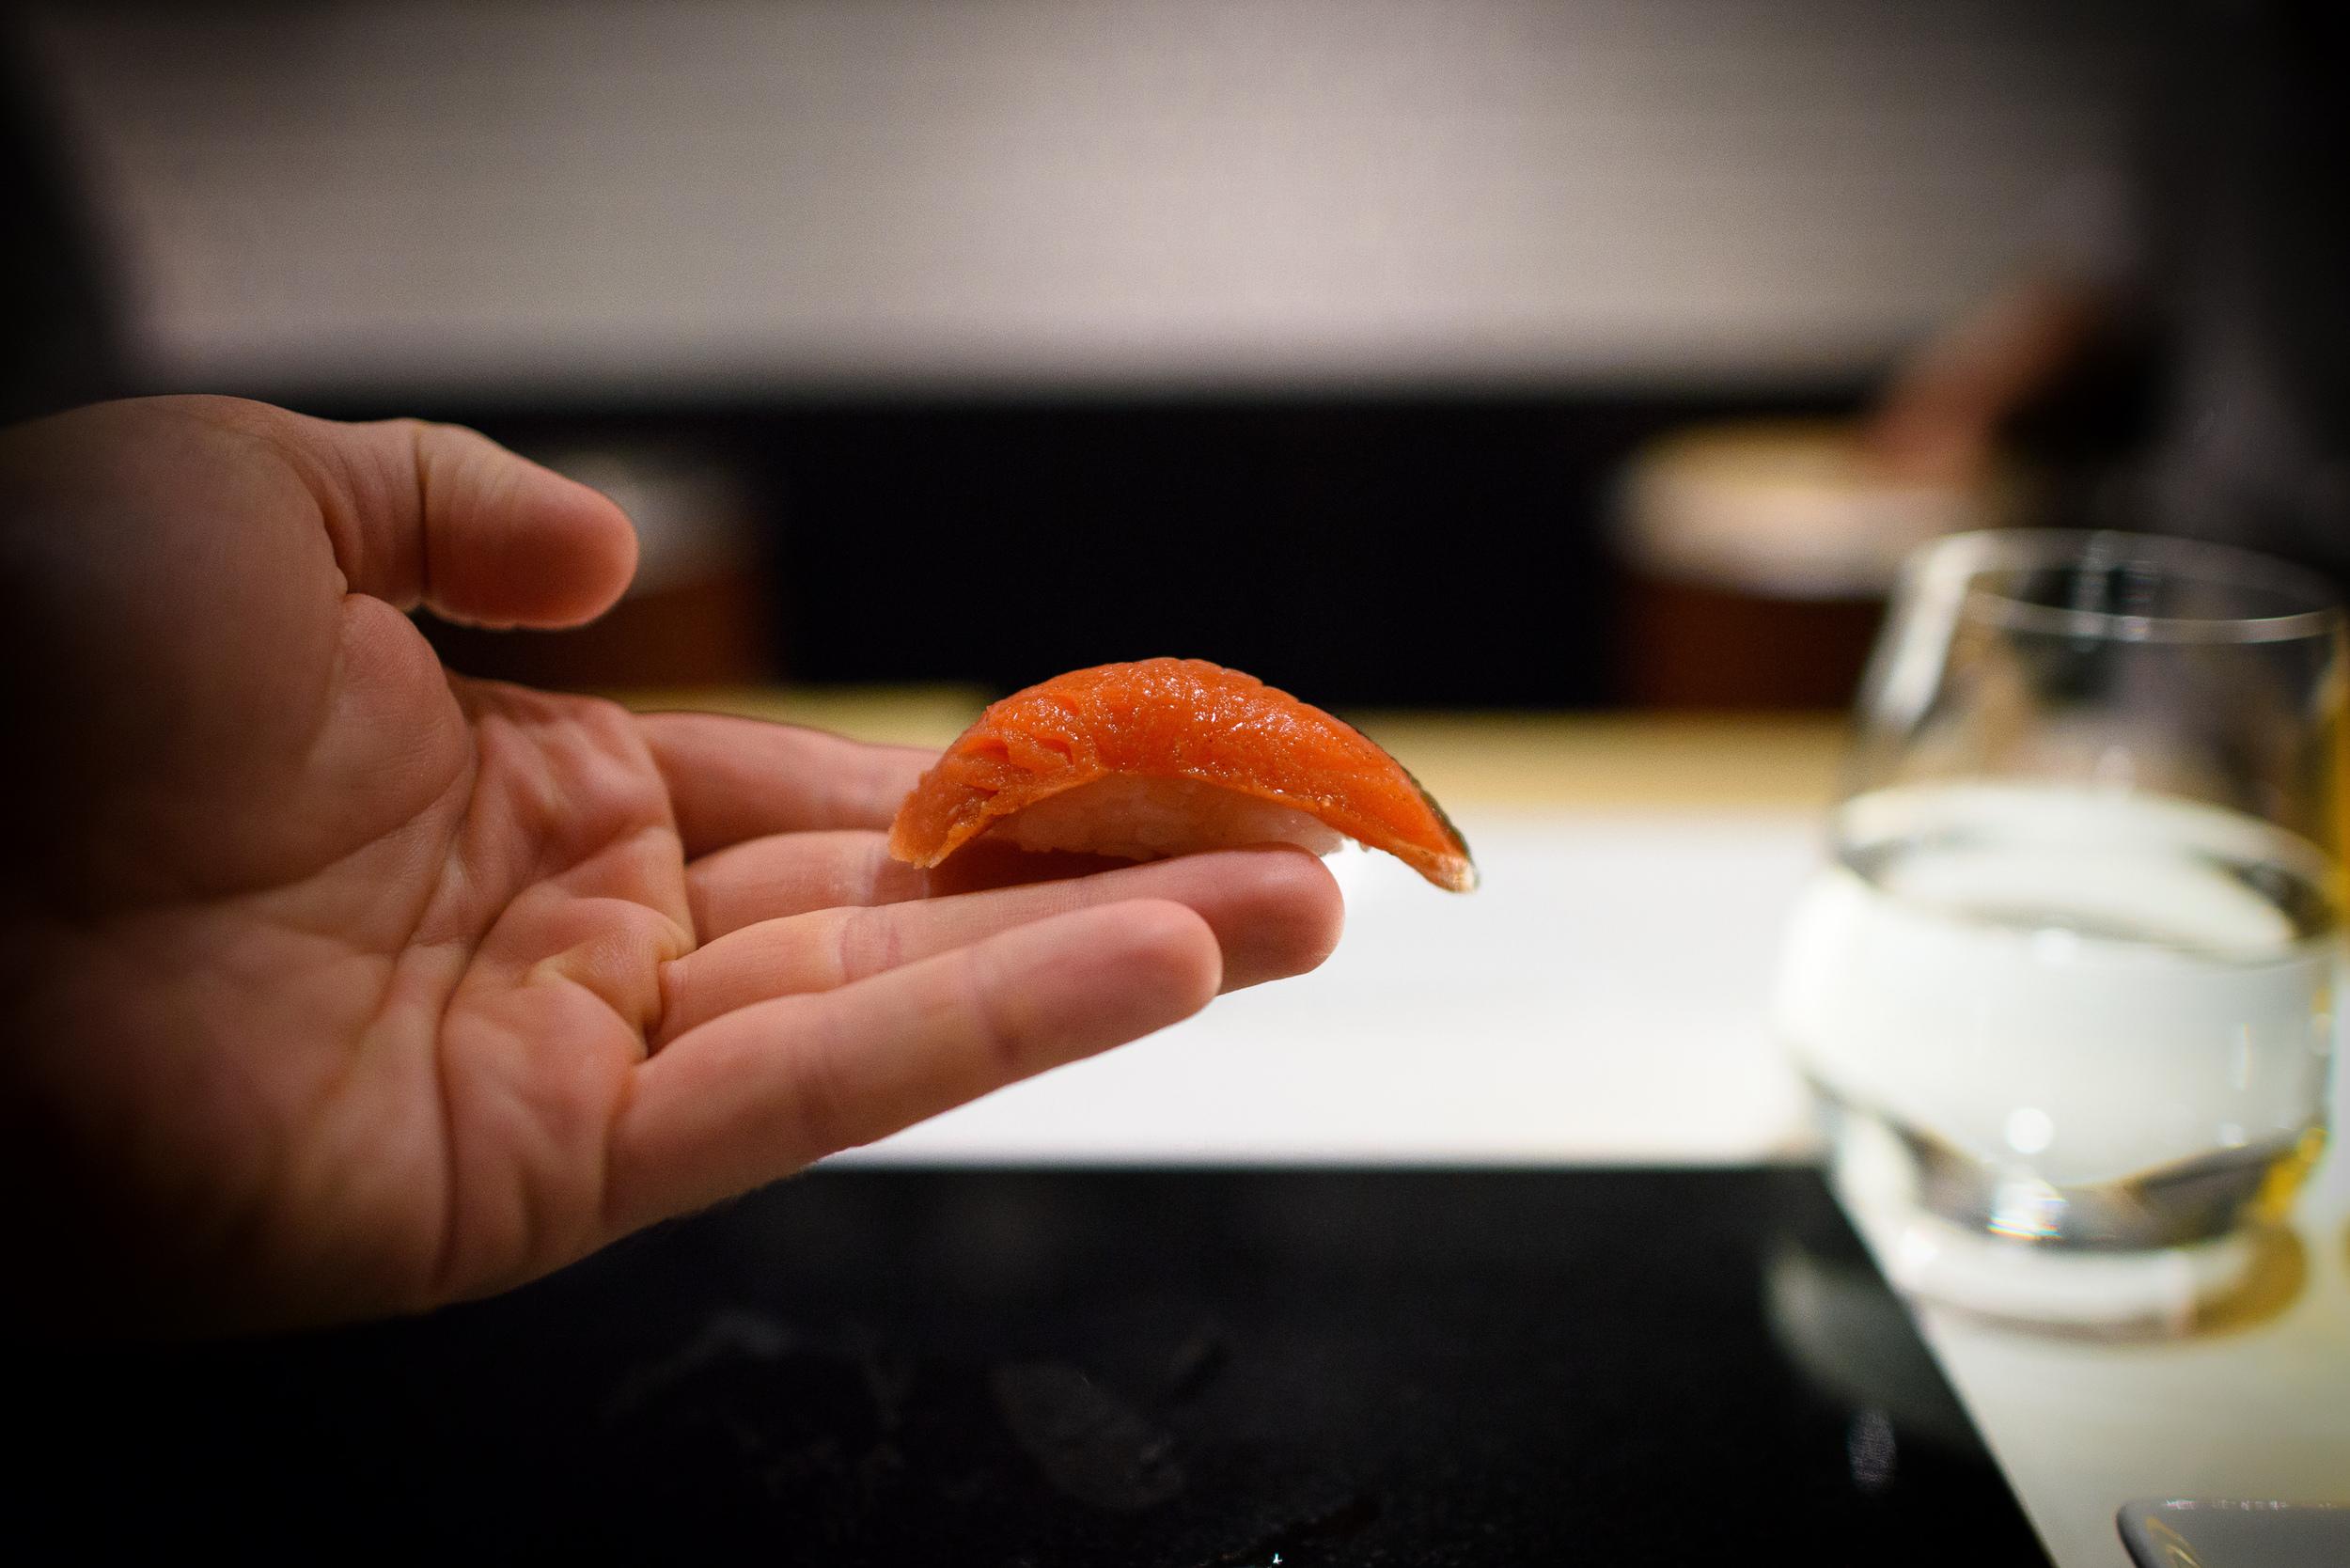 2nd Course: Wild house-smoked sockeye salmon from Alaska